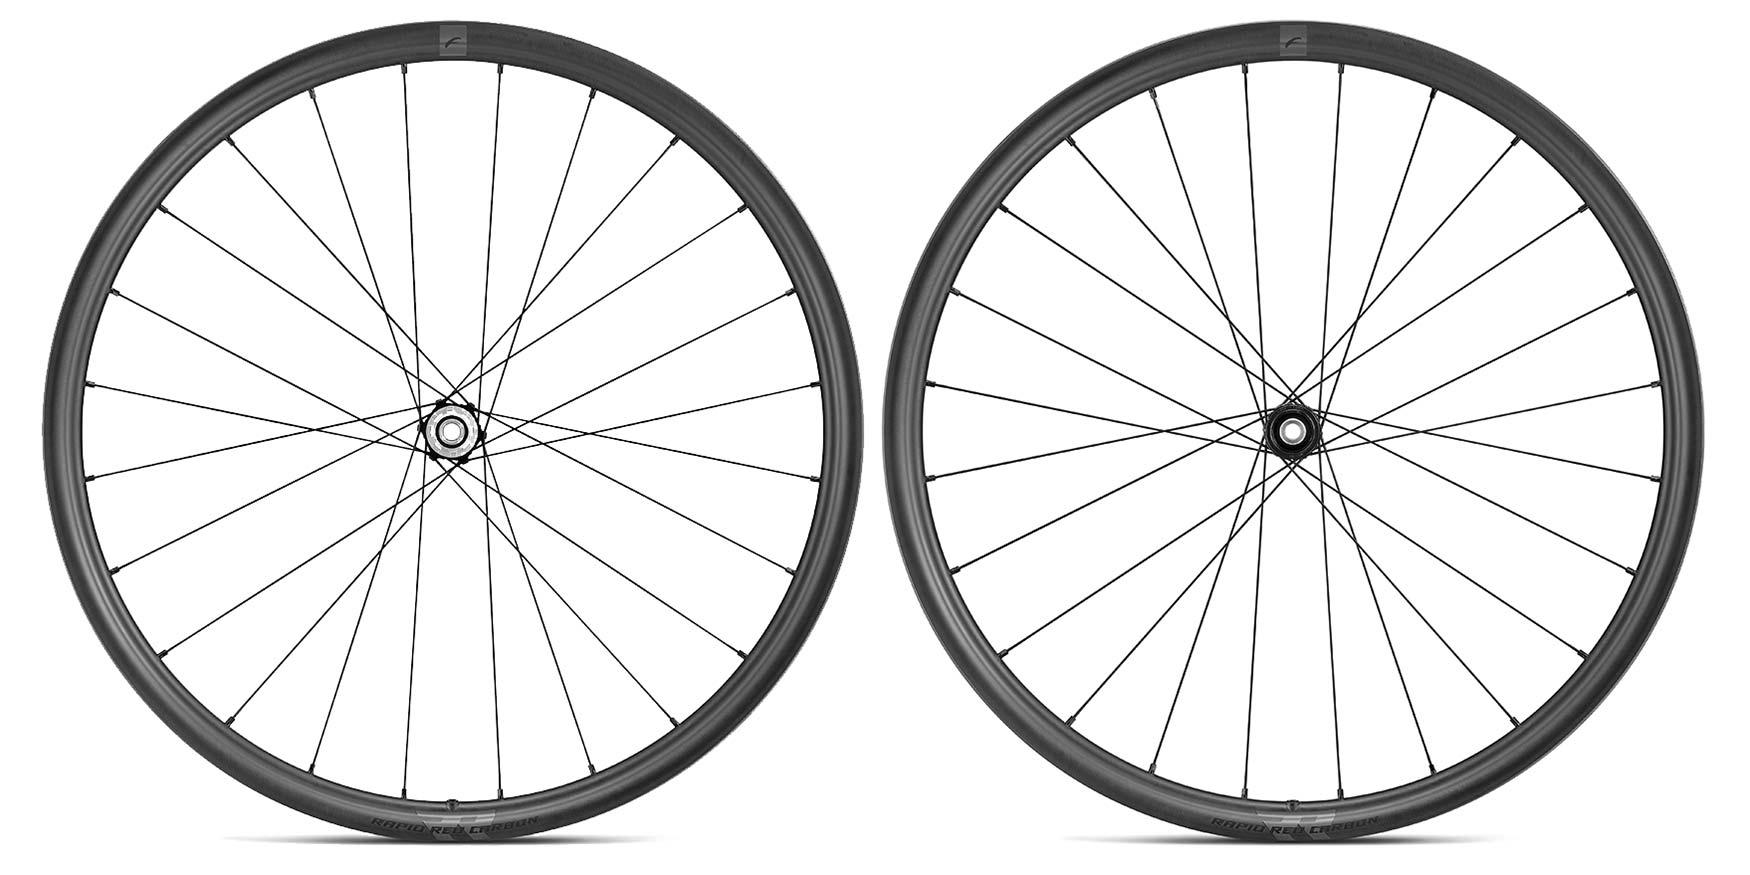 Fulcrum Rapid Red Carbon lightweight asymmetric tubeless gravel bike wheels,pair